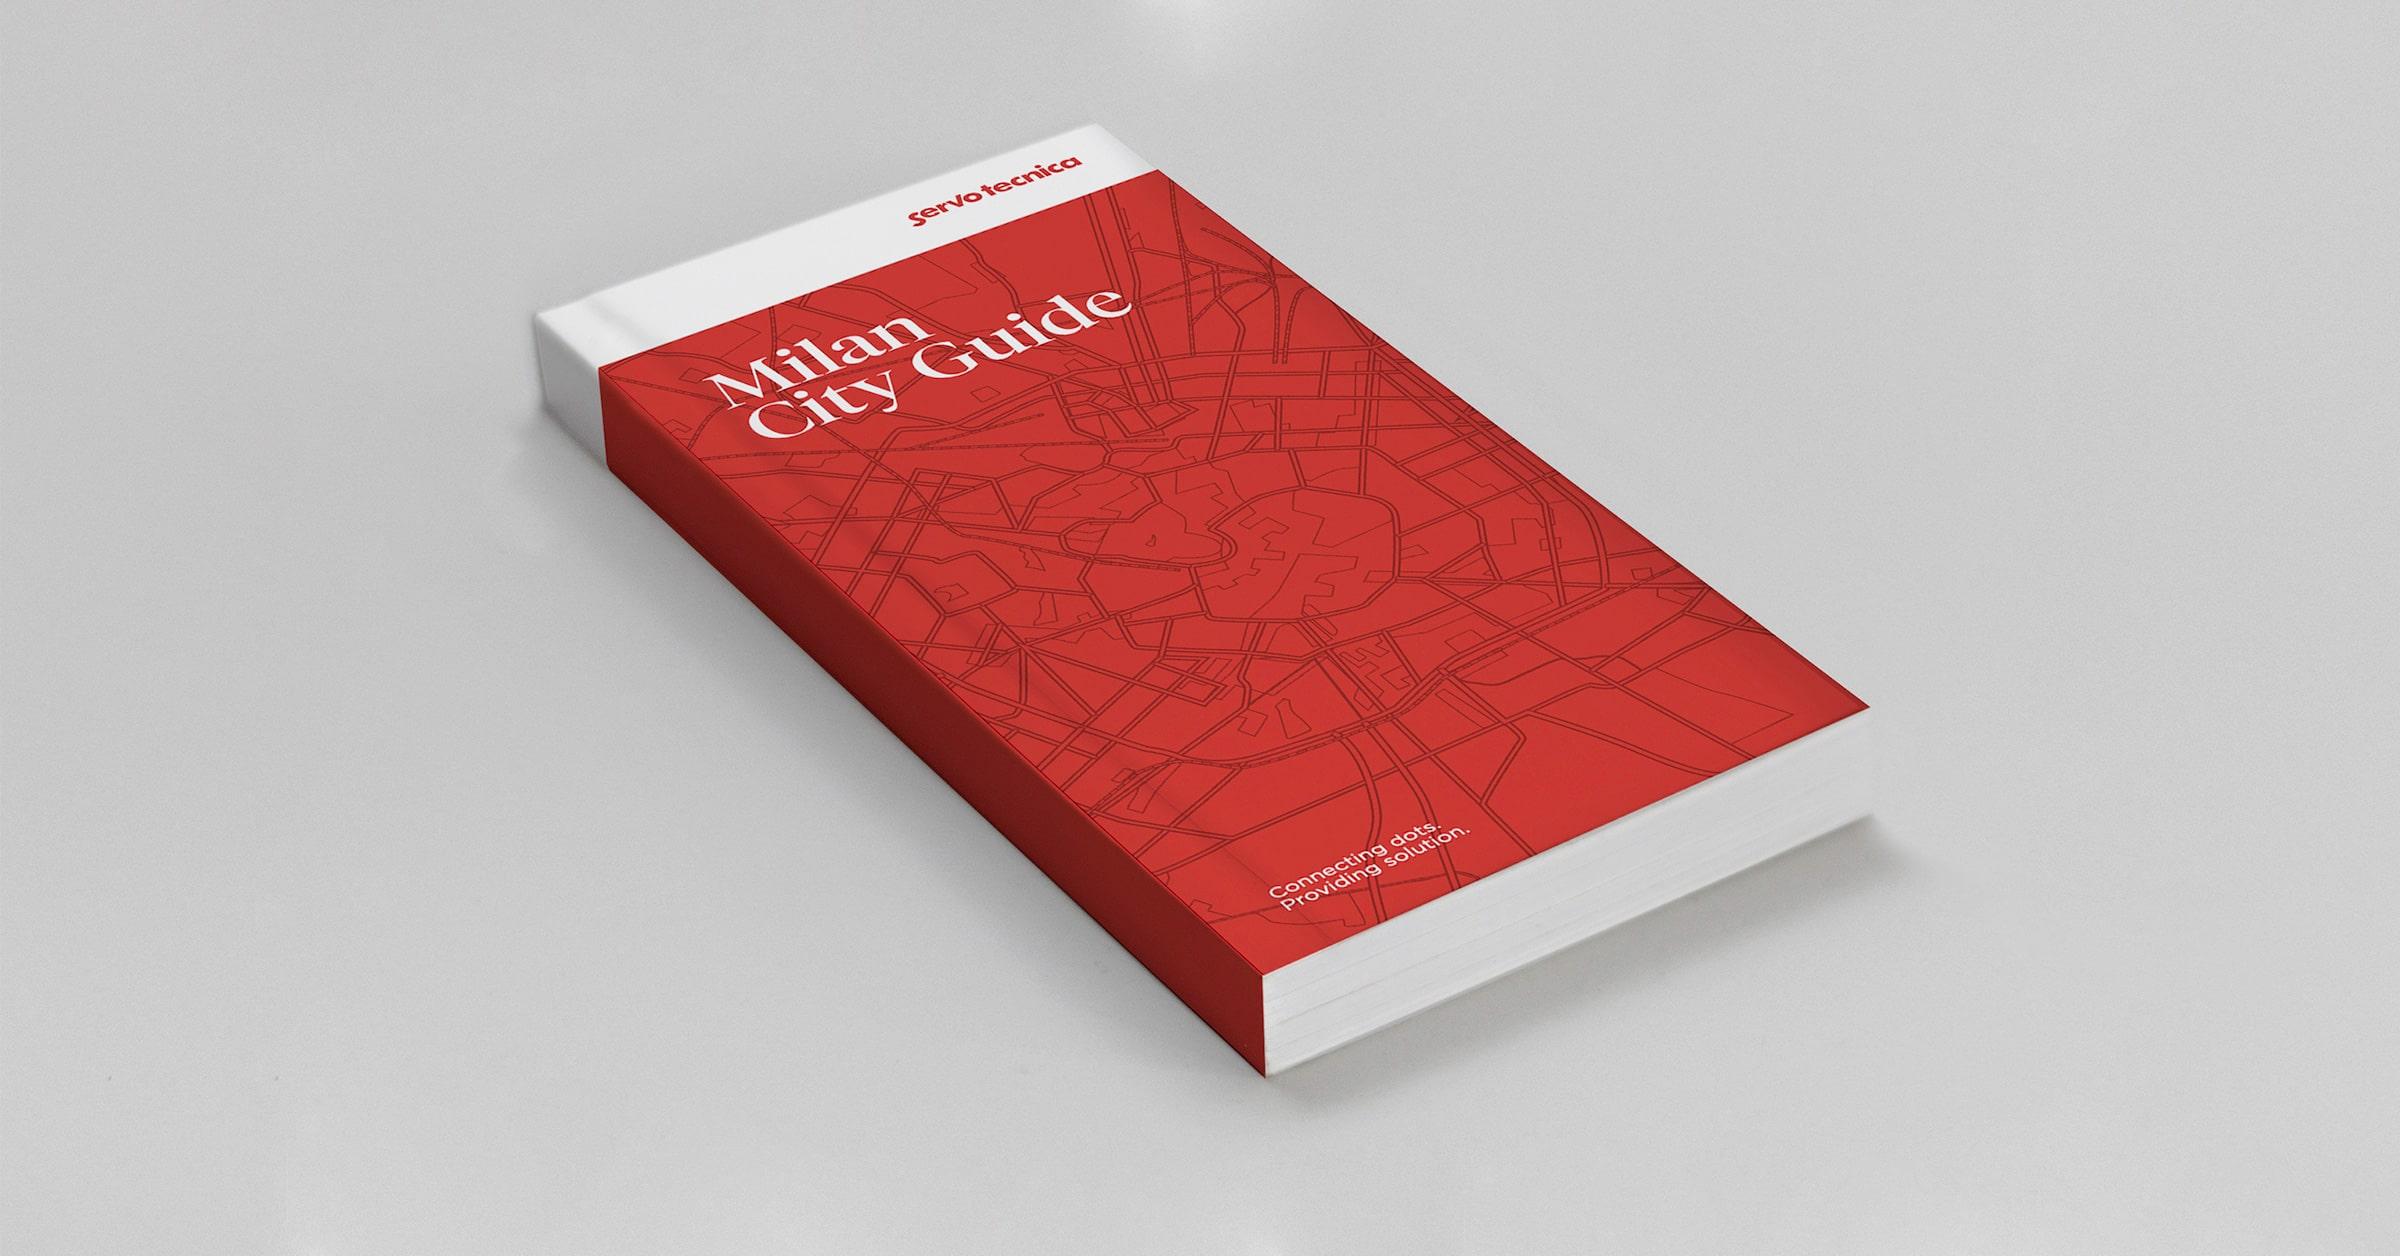 Guida di Milano Servotecnica